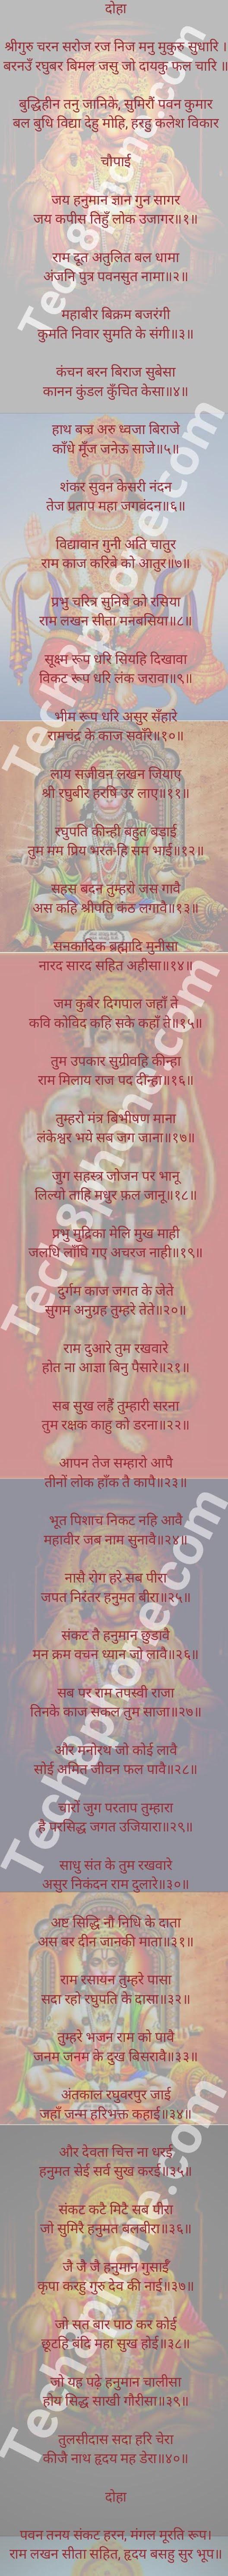 Hanuman chalisa image, Hanuman chalisa lyrics image